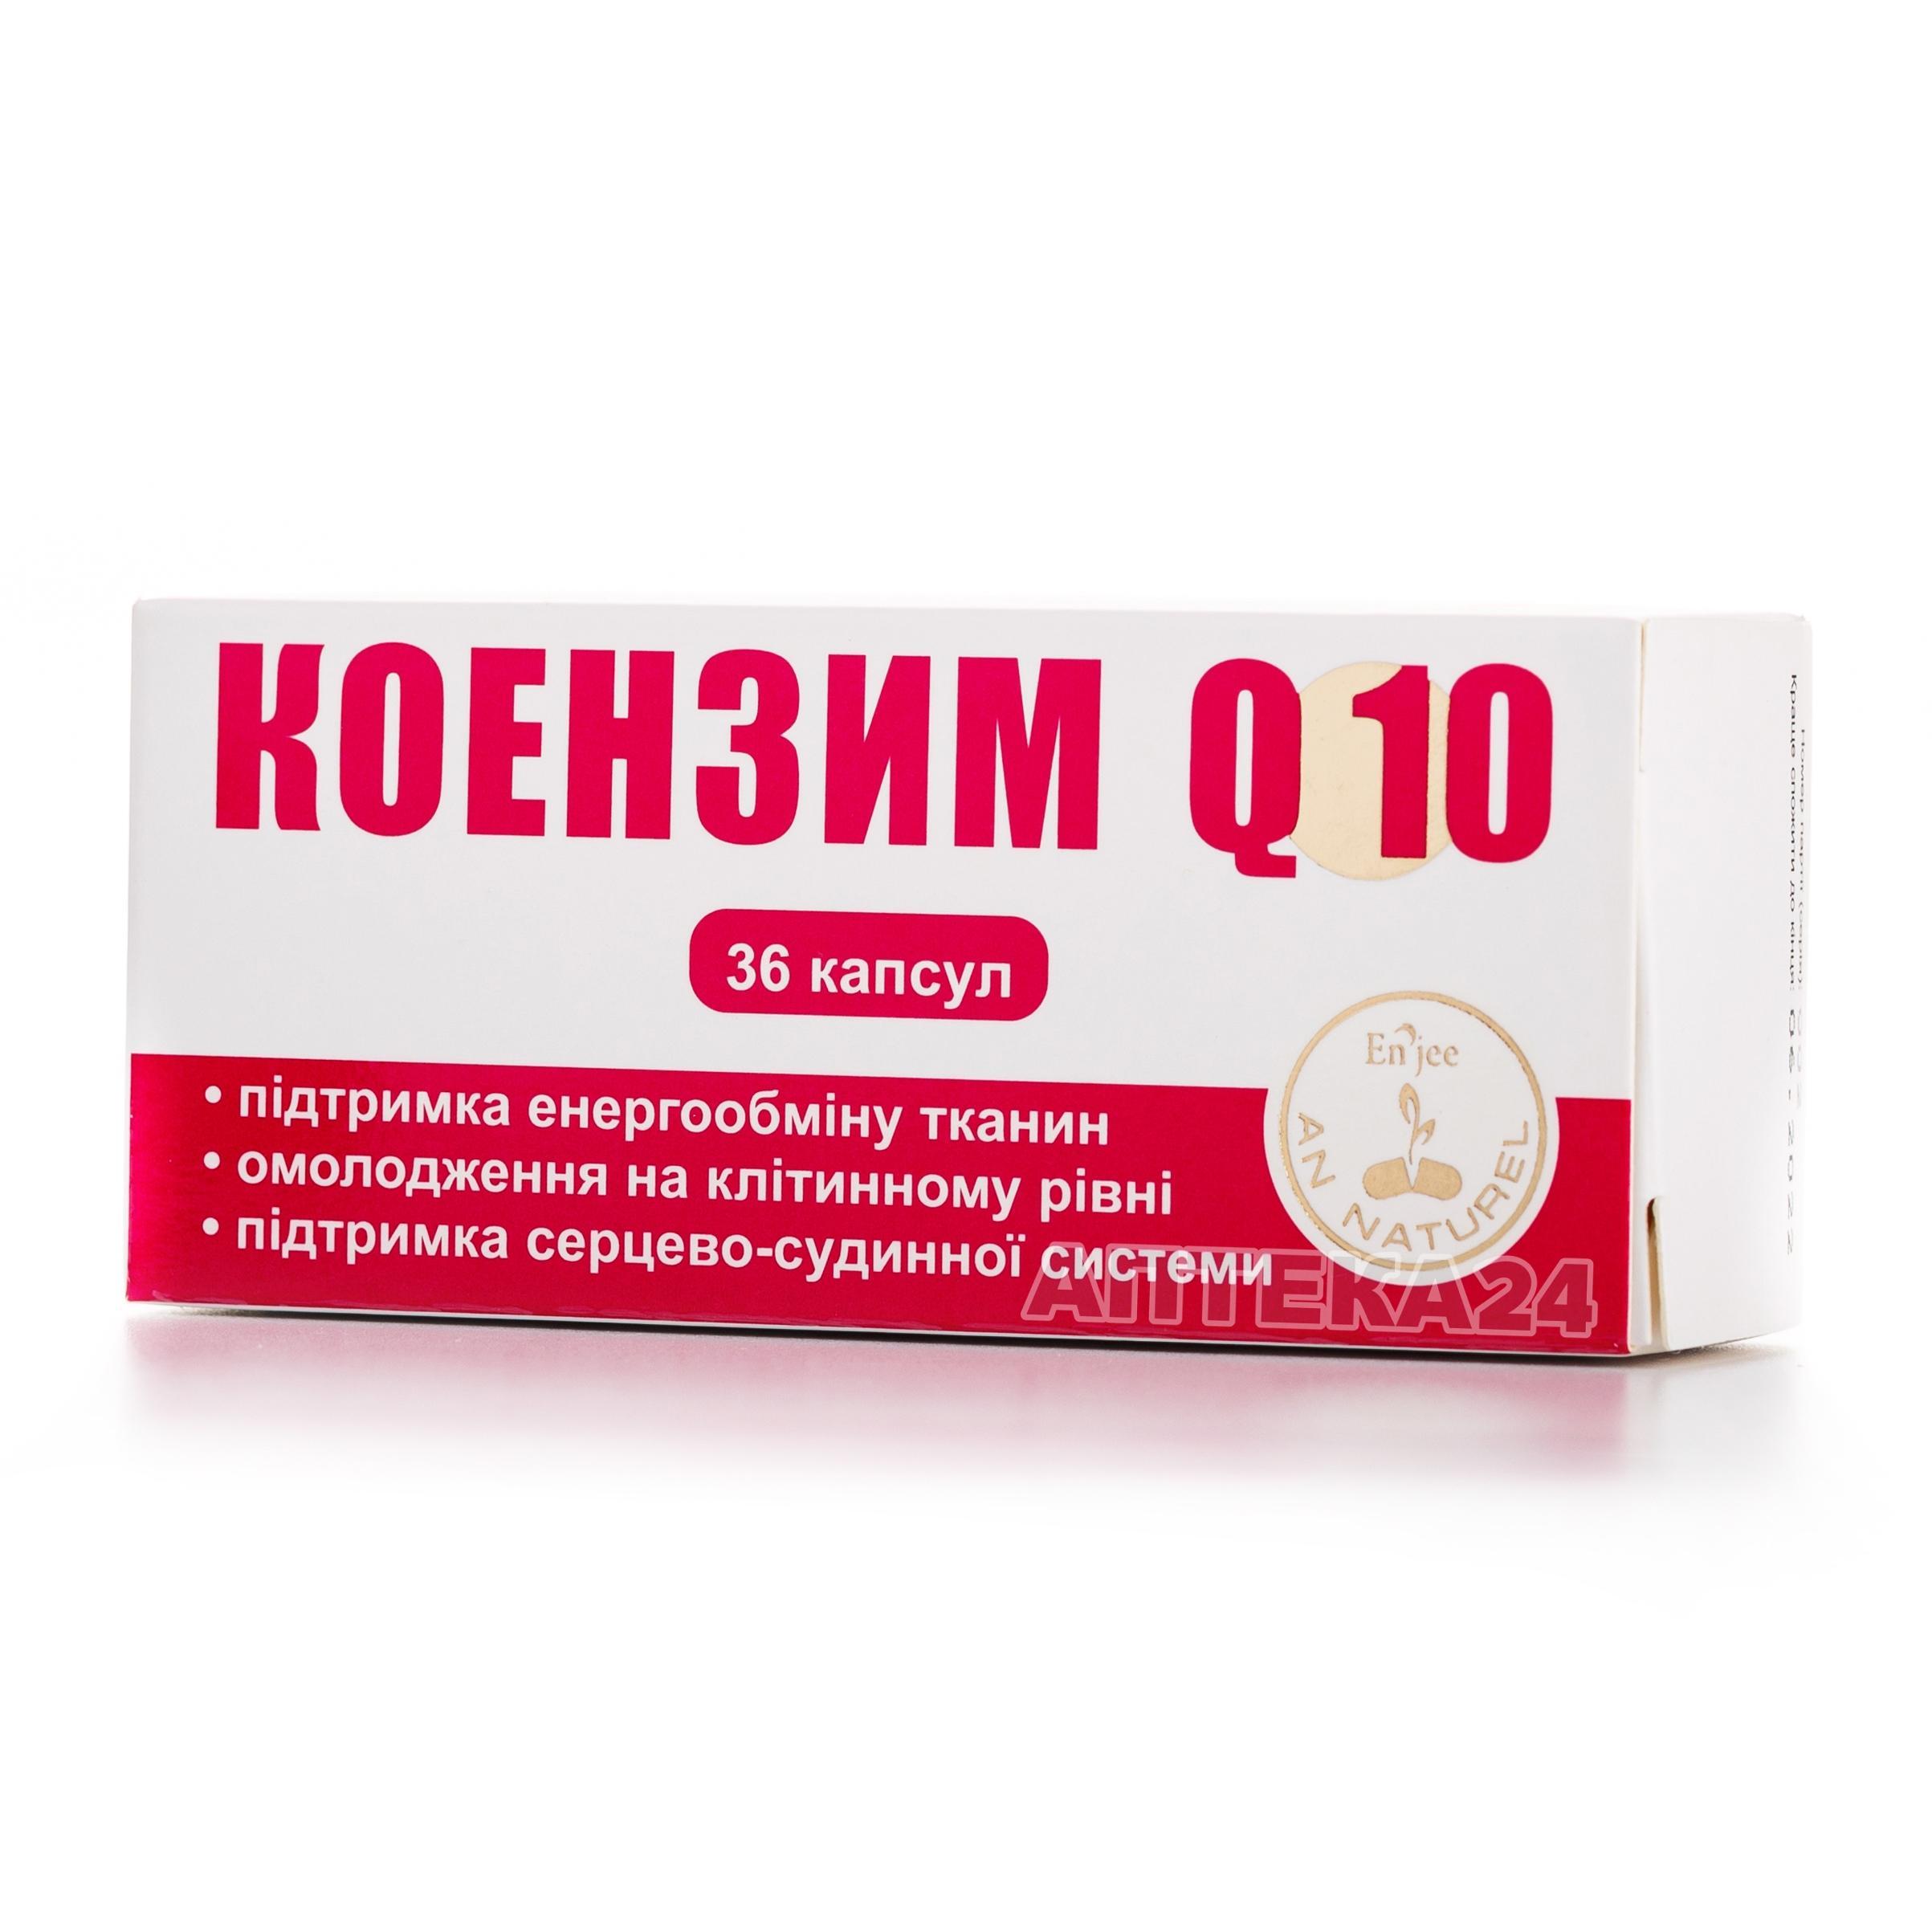 Коэнзим Q-10 30 мг N36 капсулы_60069e67c21a5.jpeg